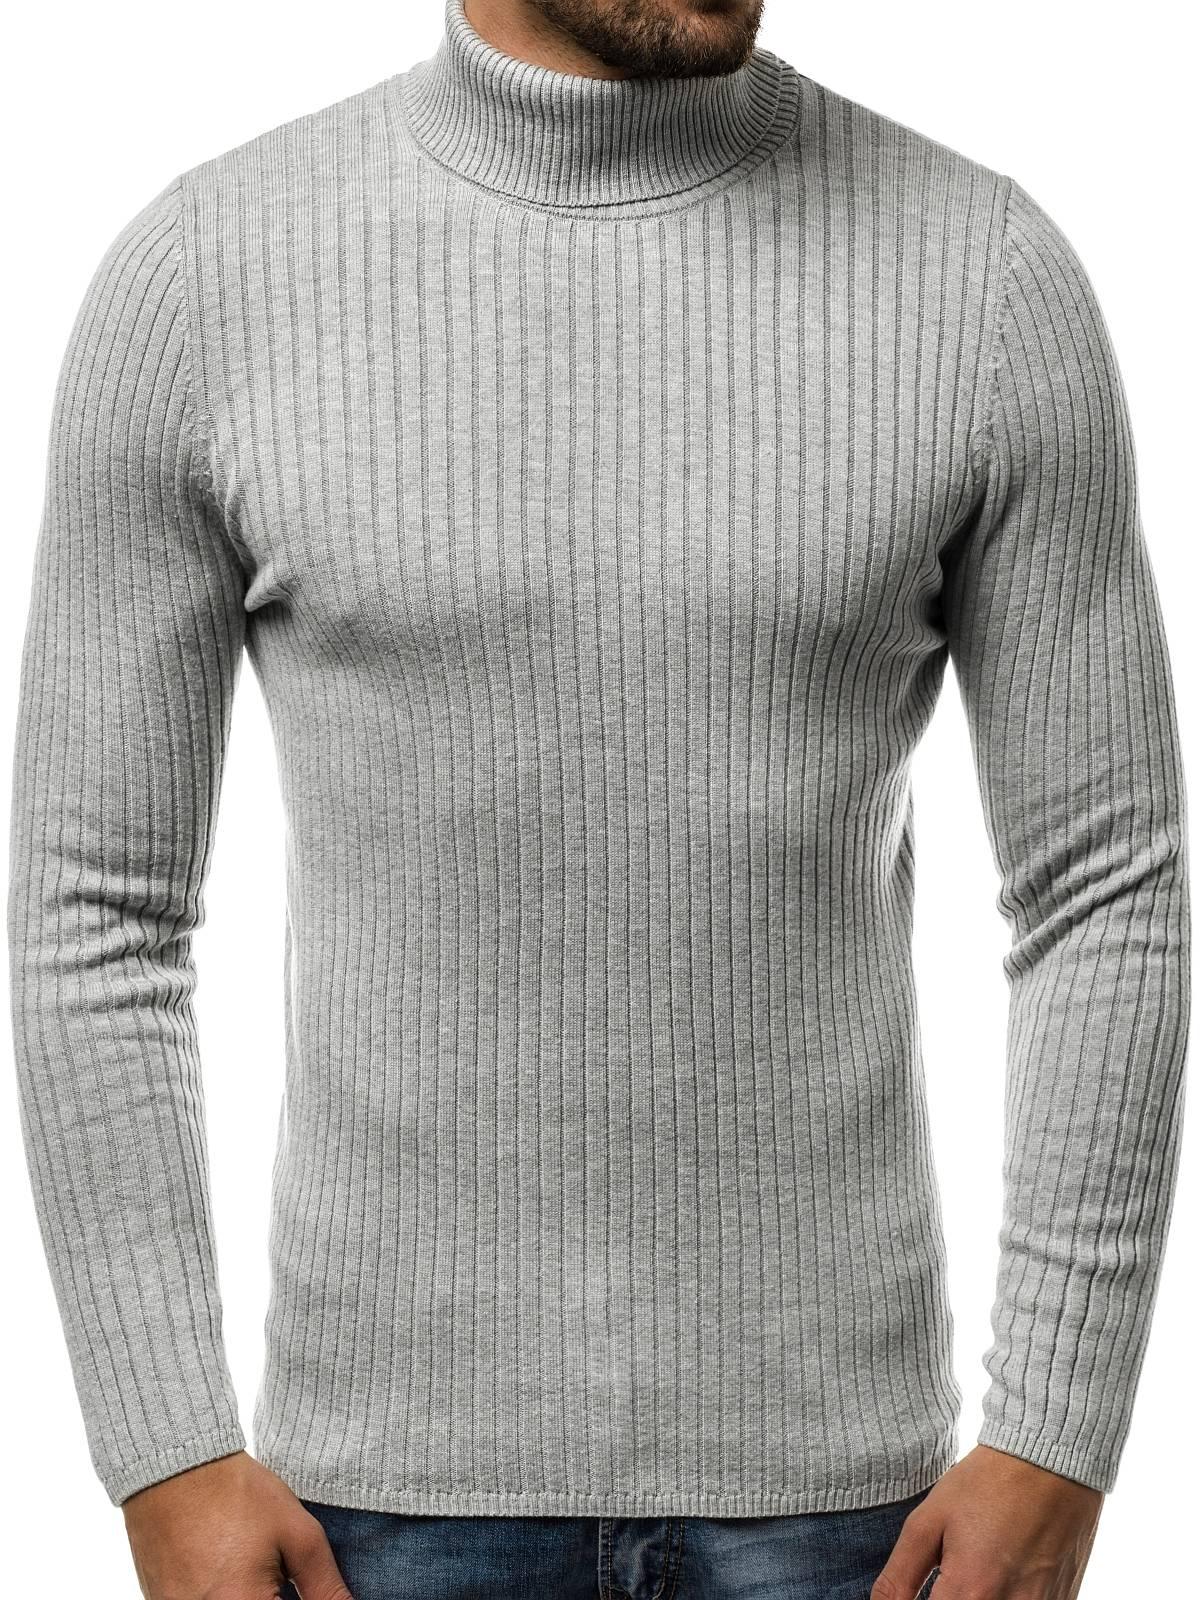 5dac6a4fcb86 Strickpullover-Pullover-Sweater-Sweatshirt-Pulli-Herren-OZONEE-MADMEXT-